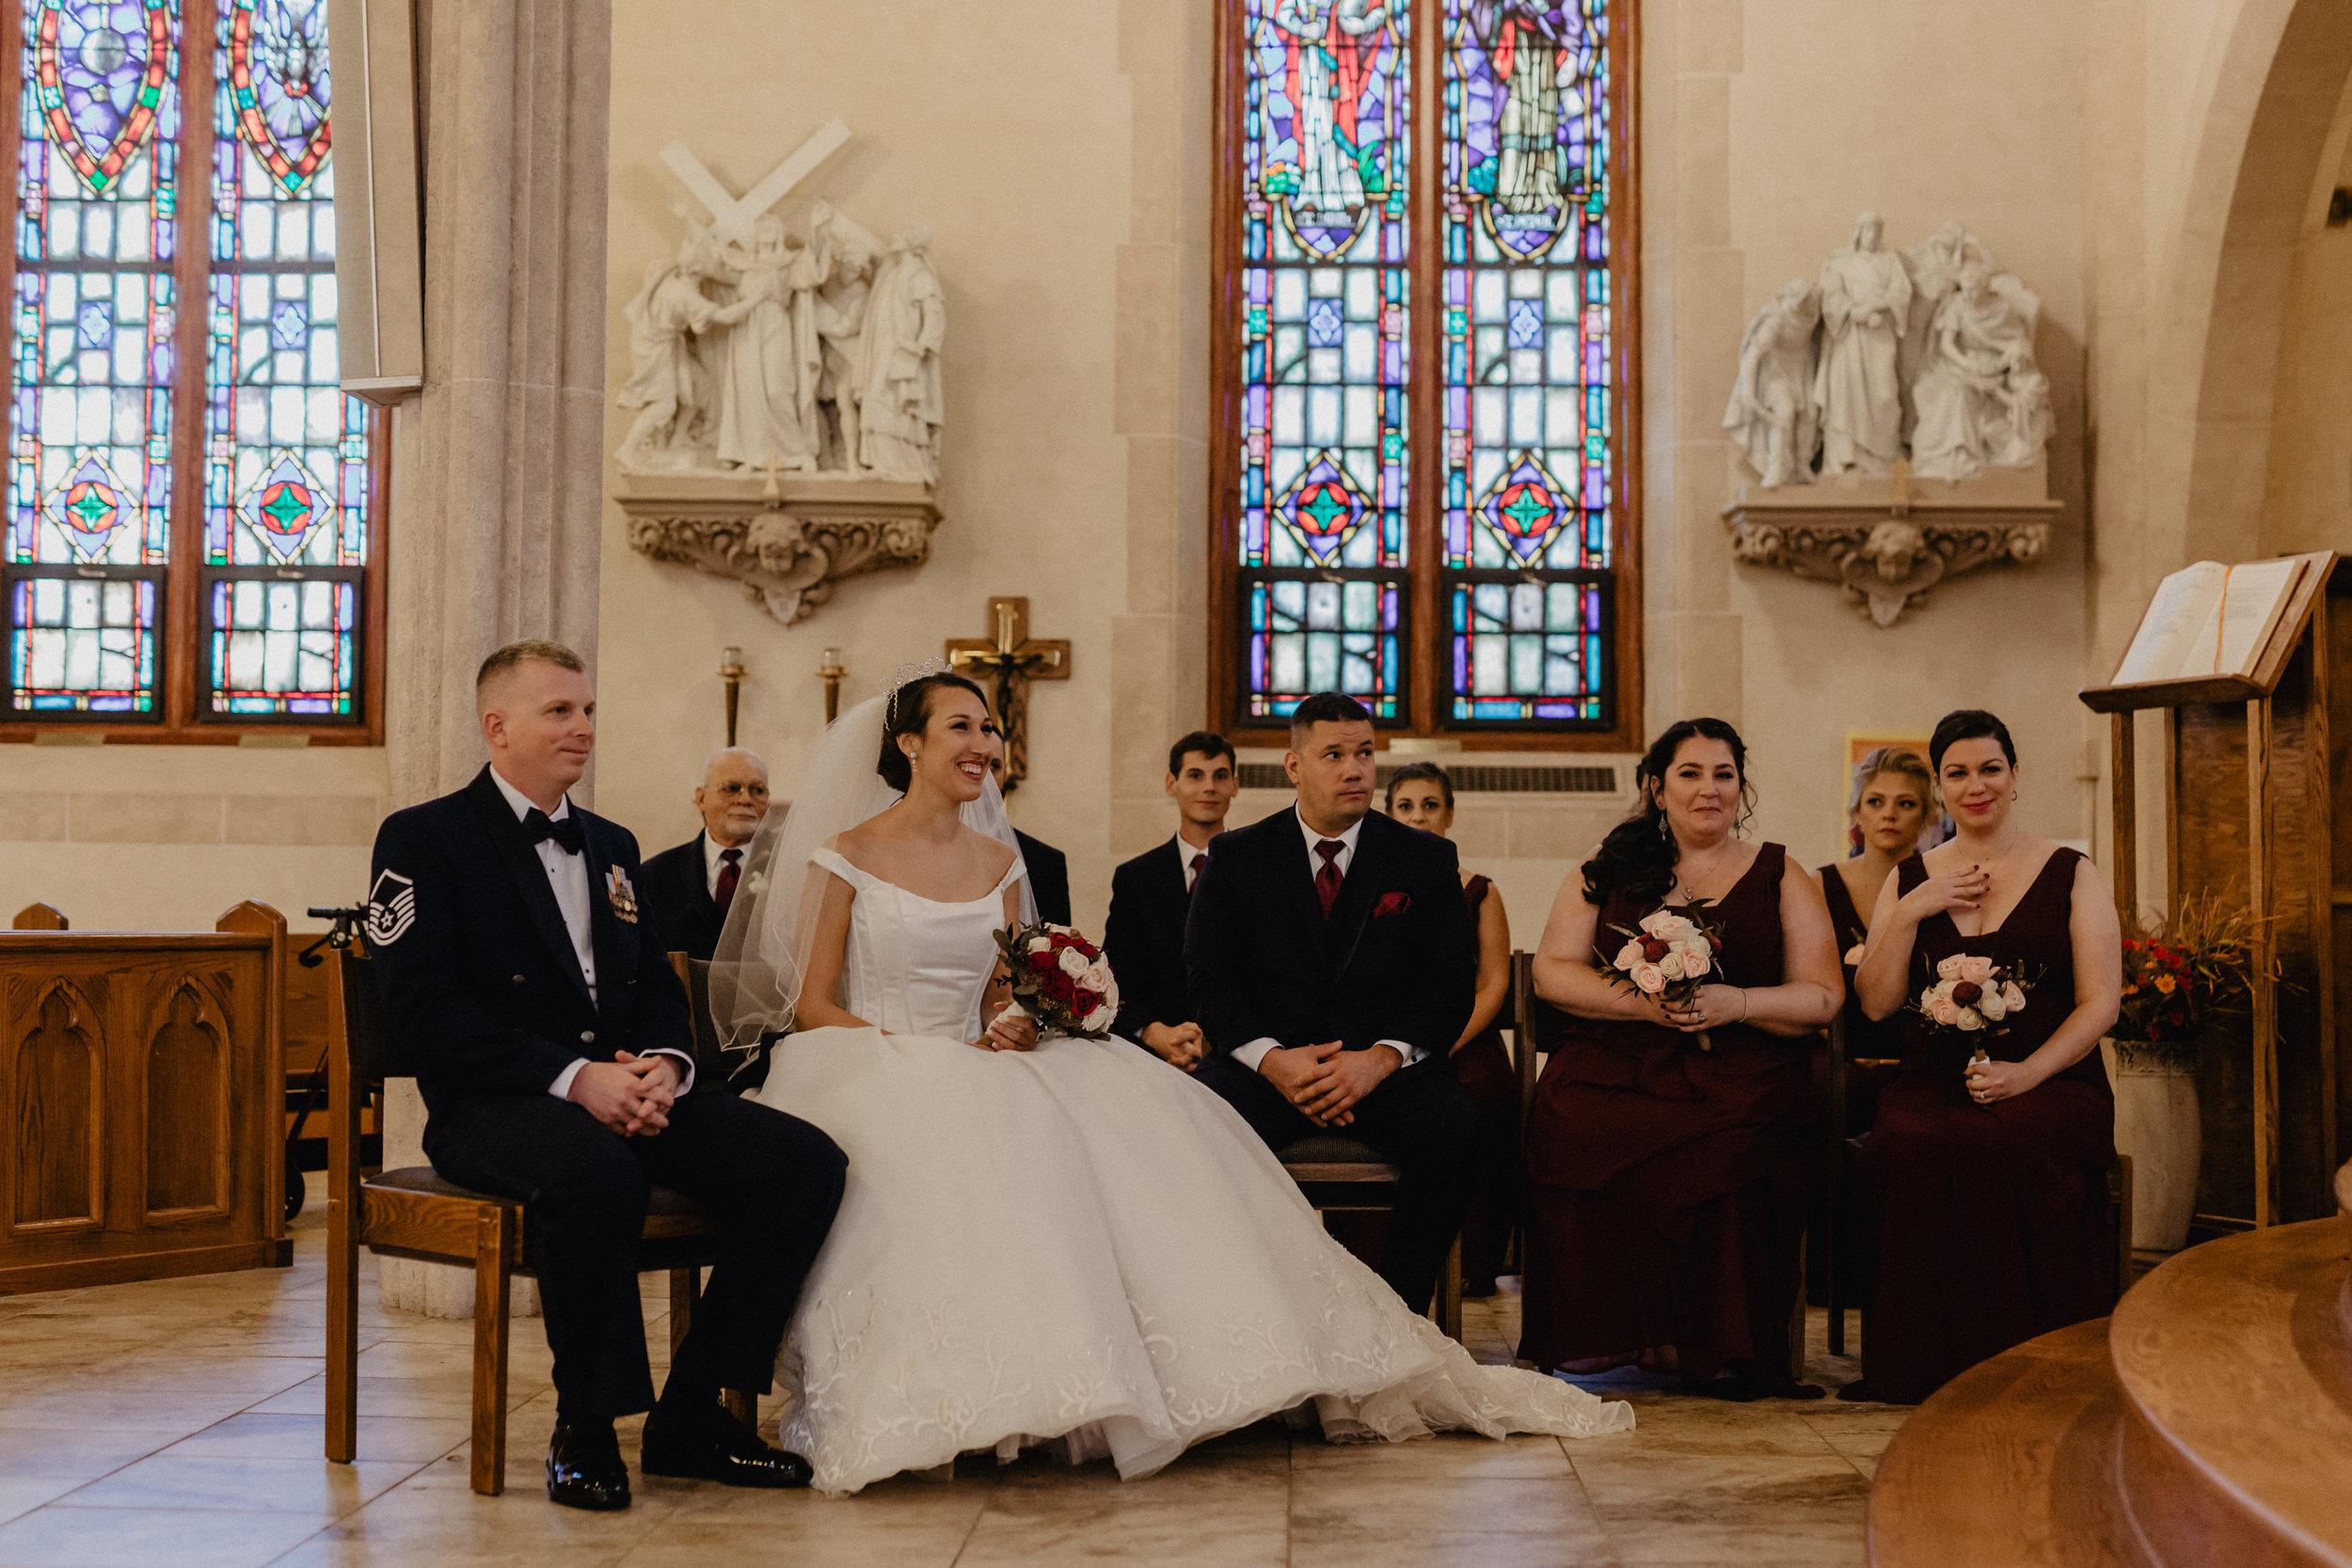 inn_at_erlowest_wedding_029.jpg